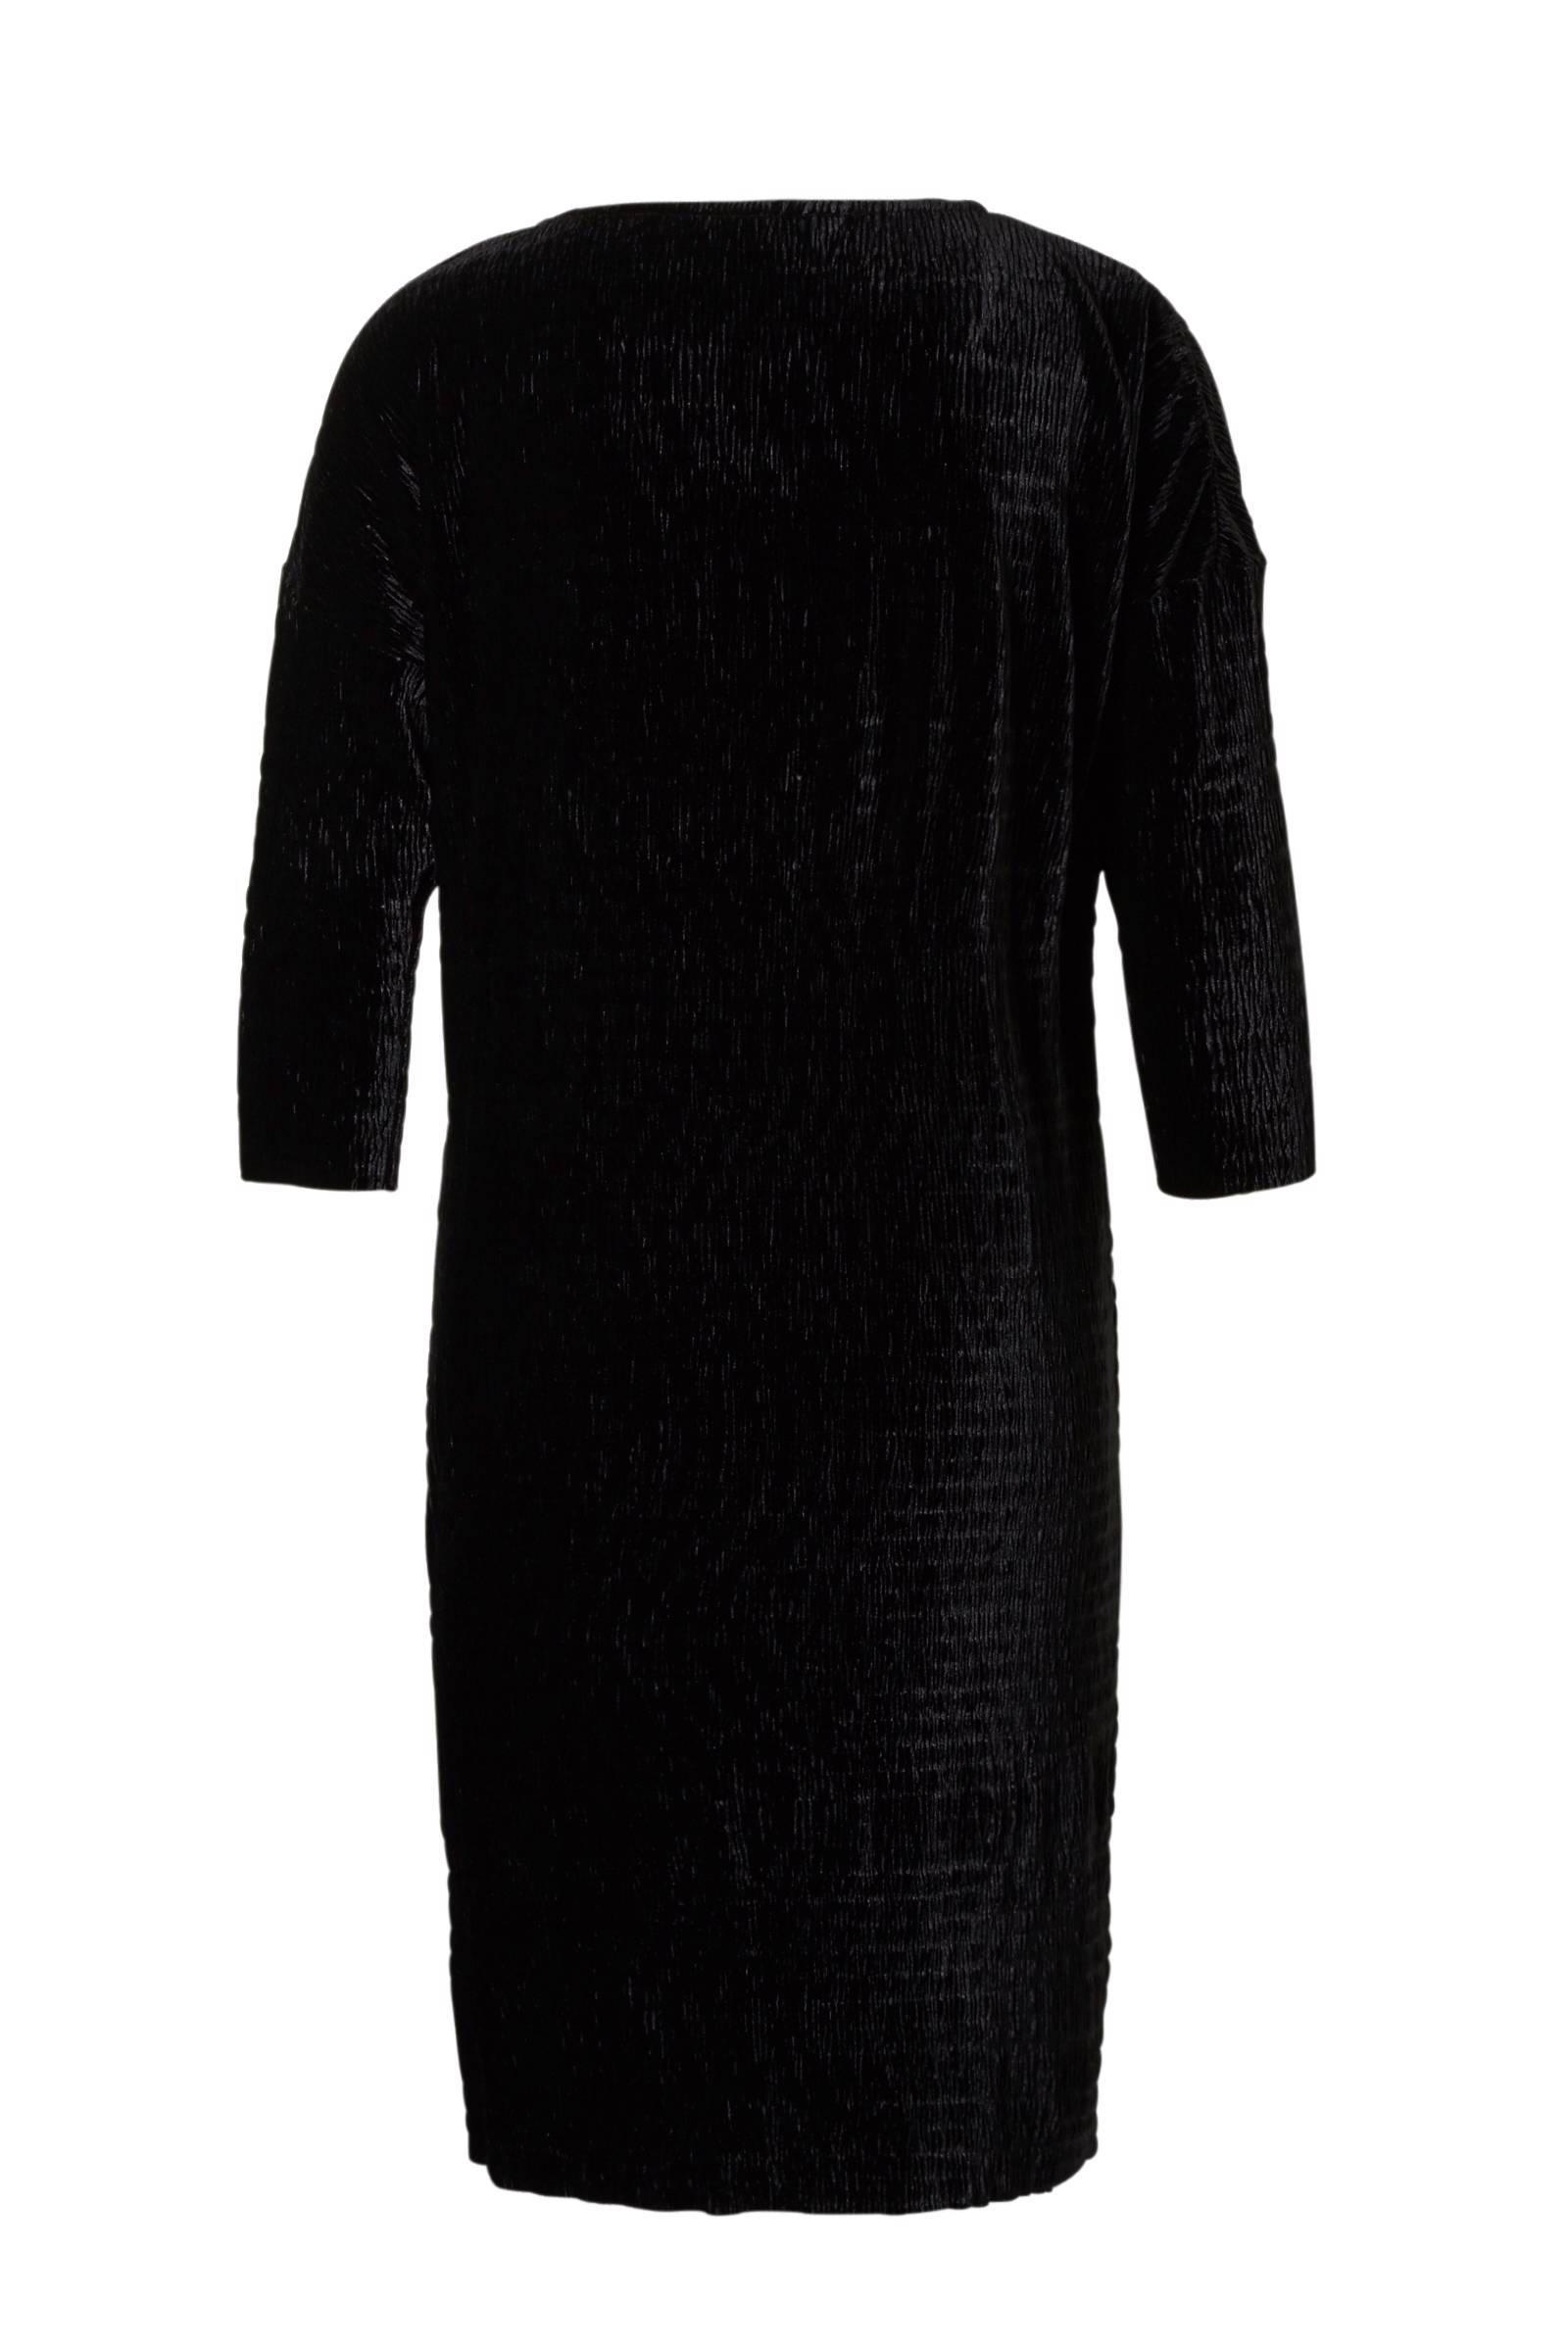 e585be2a55fb92 NÜMPH NUMPH Irene jurk